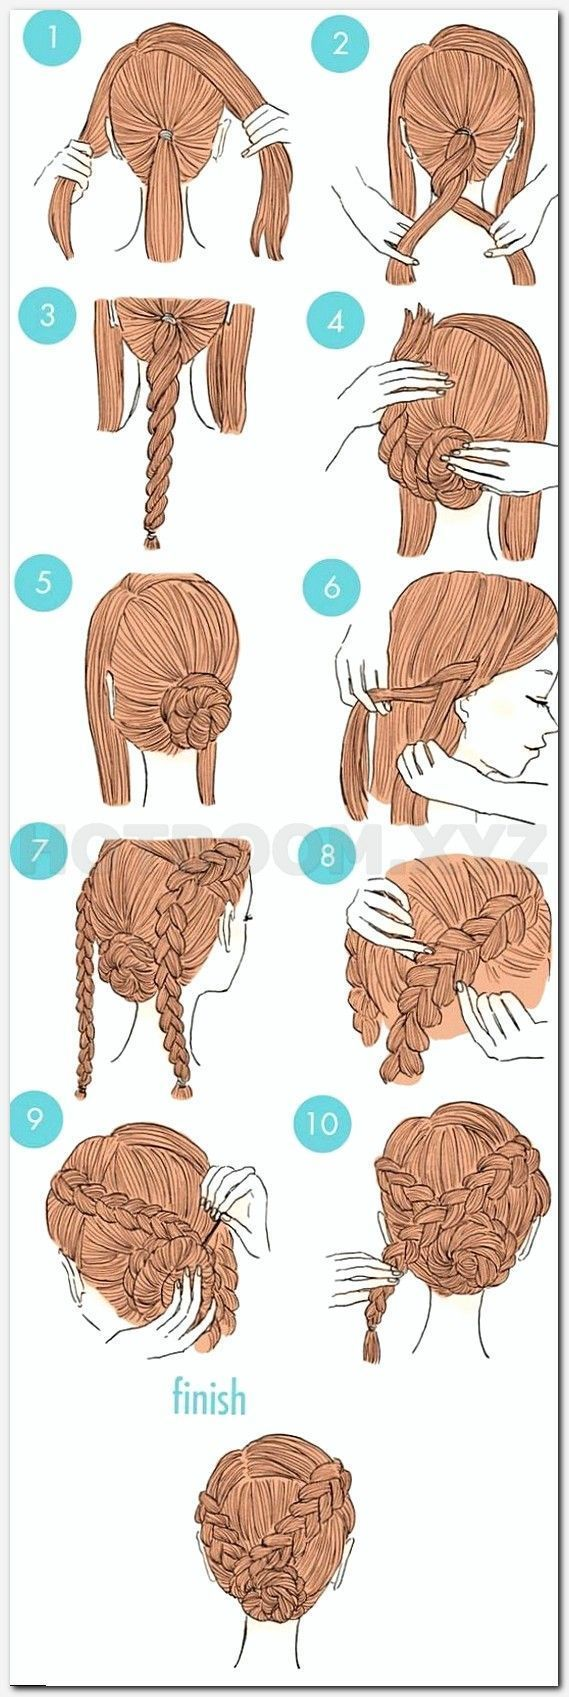 Fashionable menus haircuts hairstyles for short thin hair long